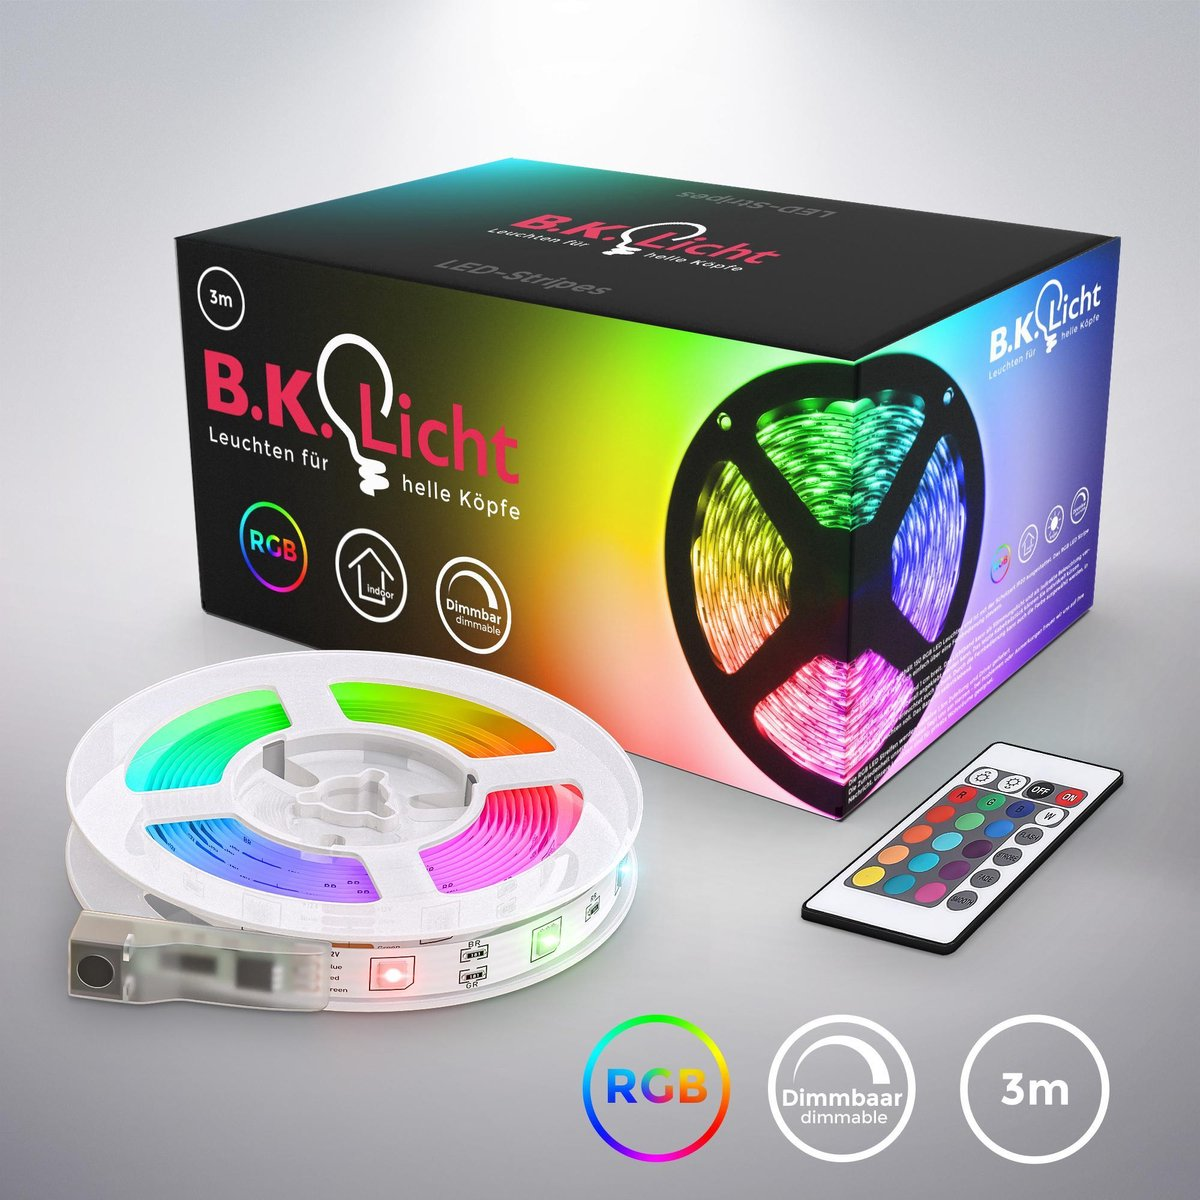 B.K.Licht - LED Strip - 3 meter - RGB - incl. afstandsbediening - incl. kleurverandering - zelfkleve